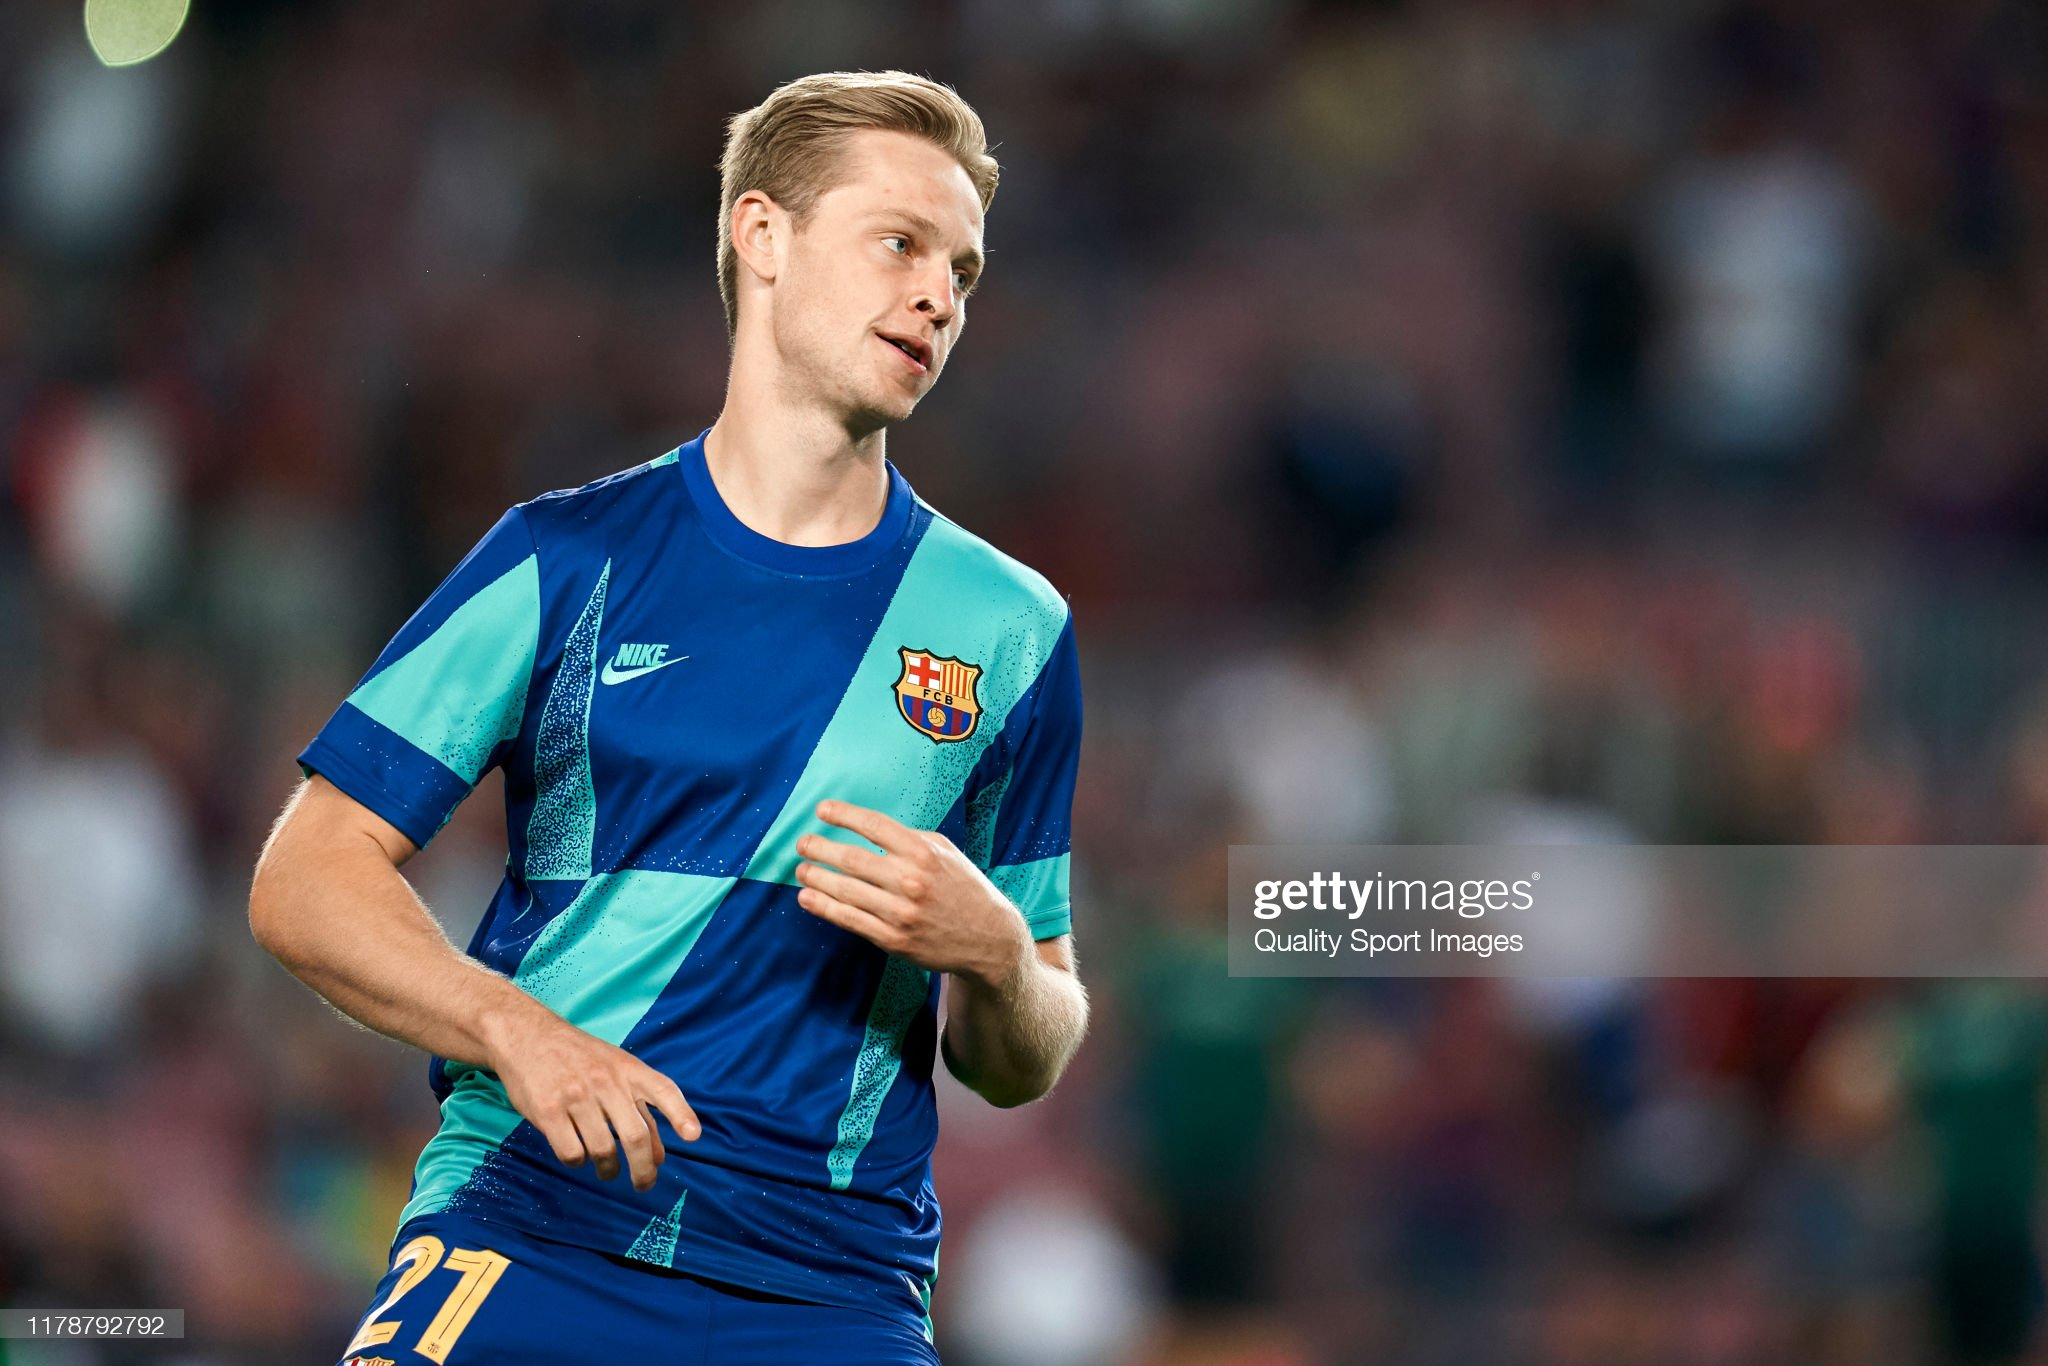 صور مباراة : برشلونة - إنتر 2-1 ( 02-10-2019 )  Frenkie-de-jong-of-fc-barcelona-looks-on-during-the-prematch-warm-up-picture-id1178792792?s=2048x2048